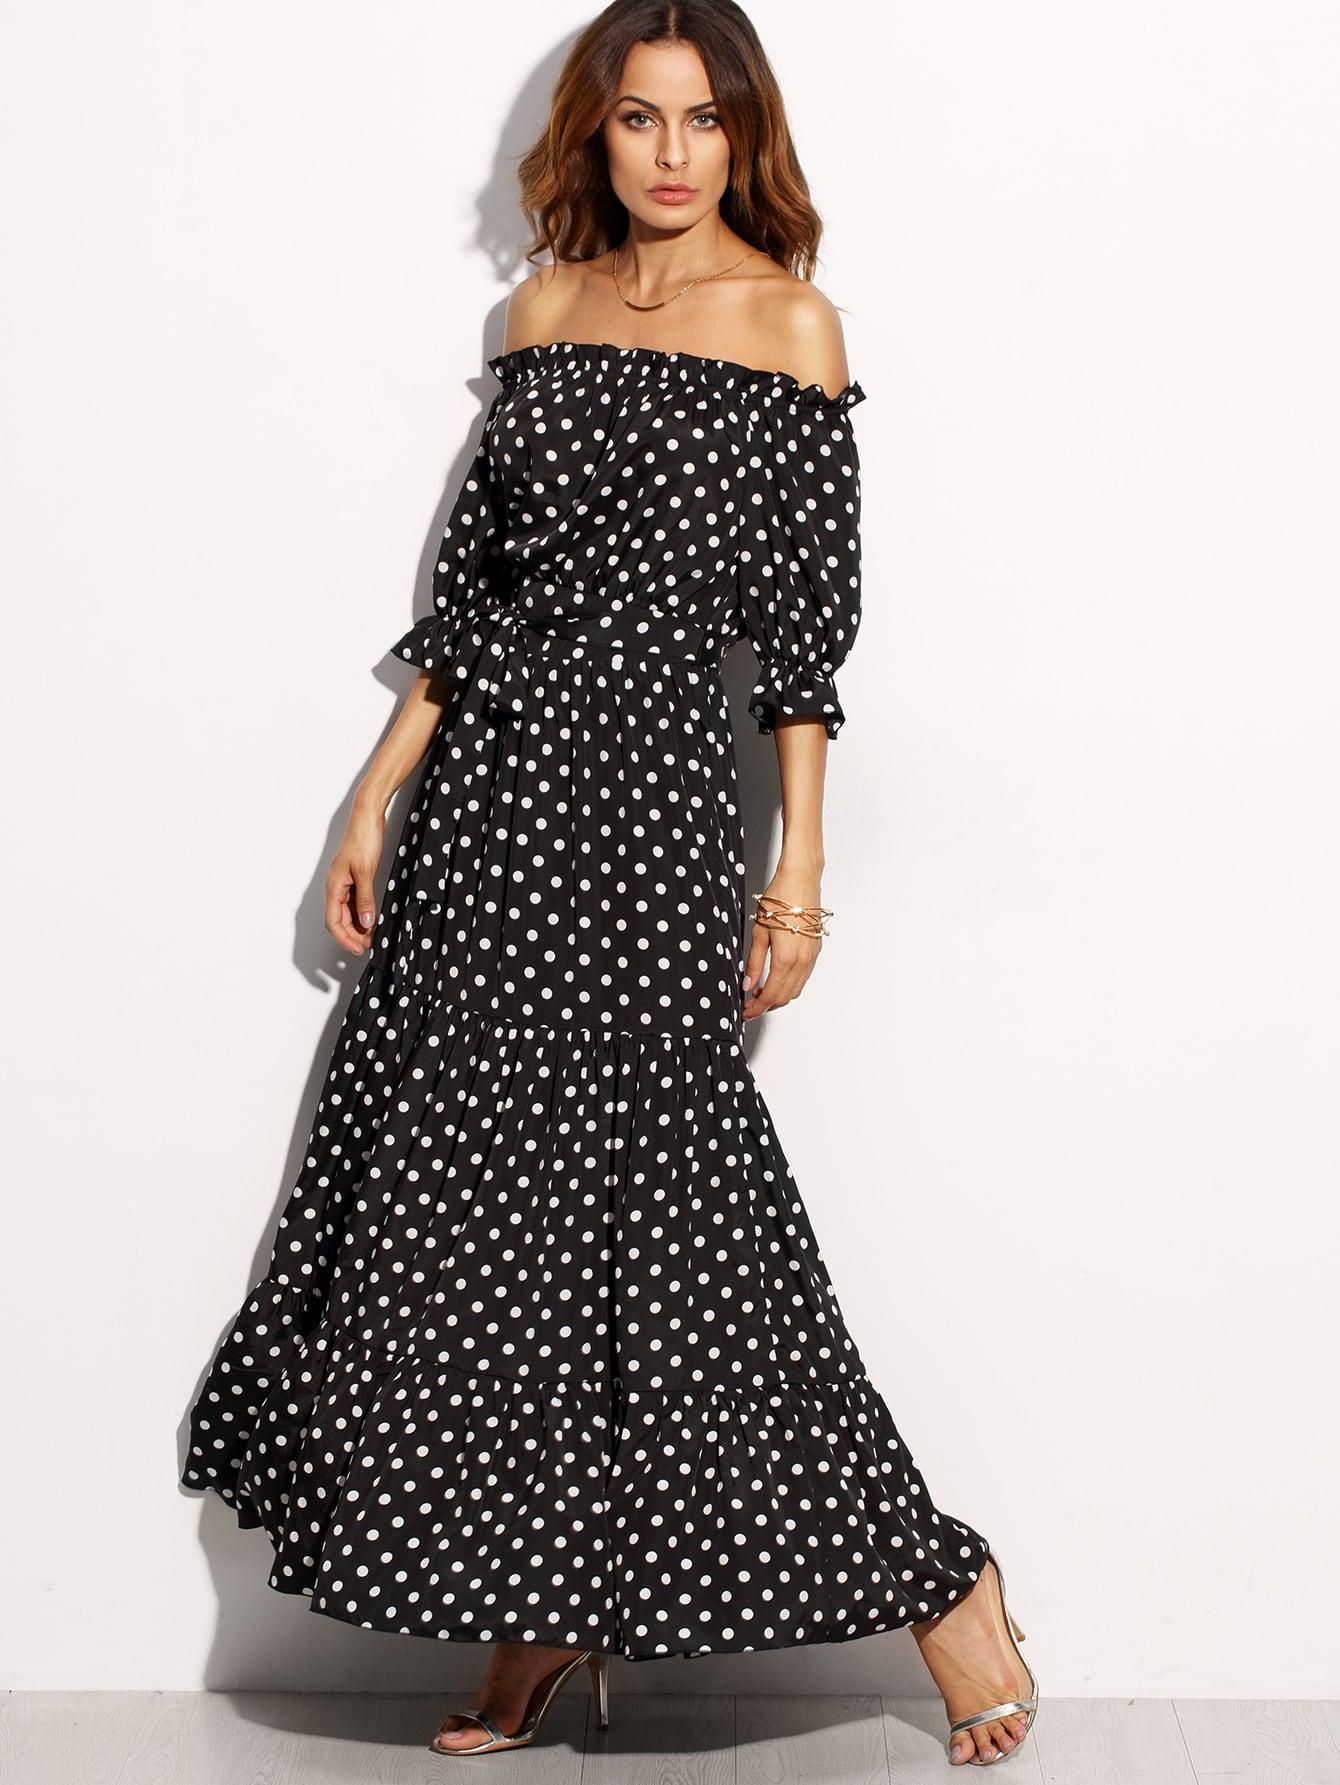 Polka Dot Off The Shoulder Tie Waist Maxi Dress dress160726504